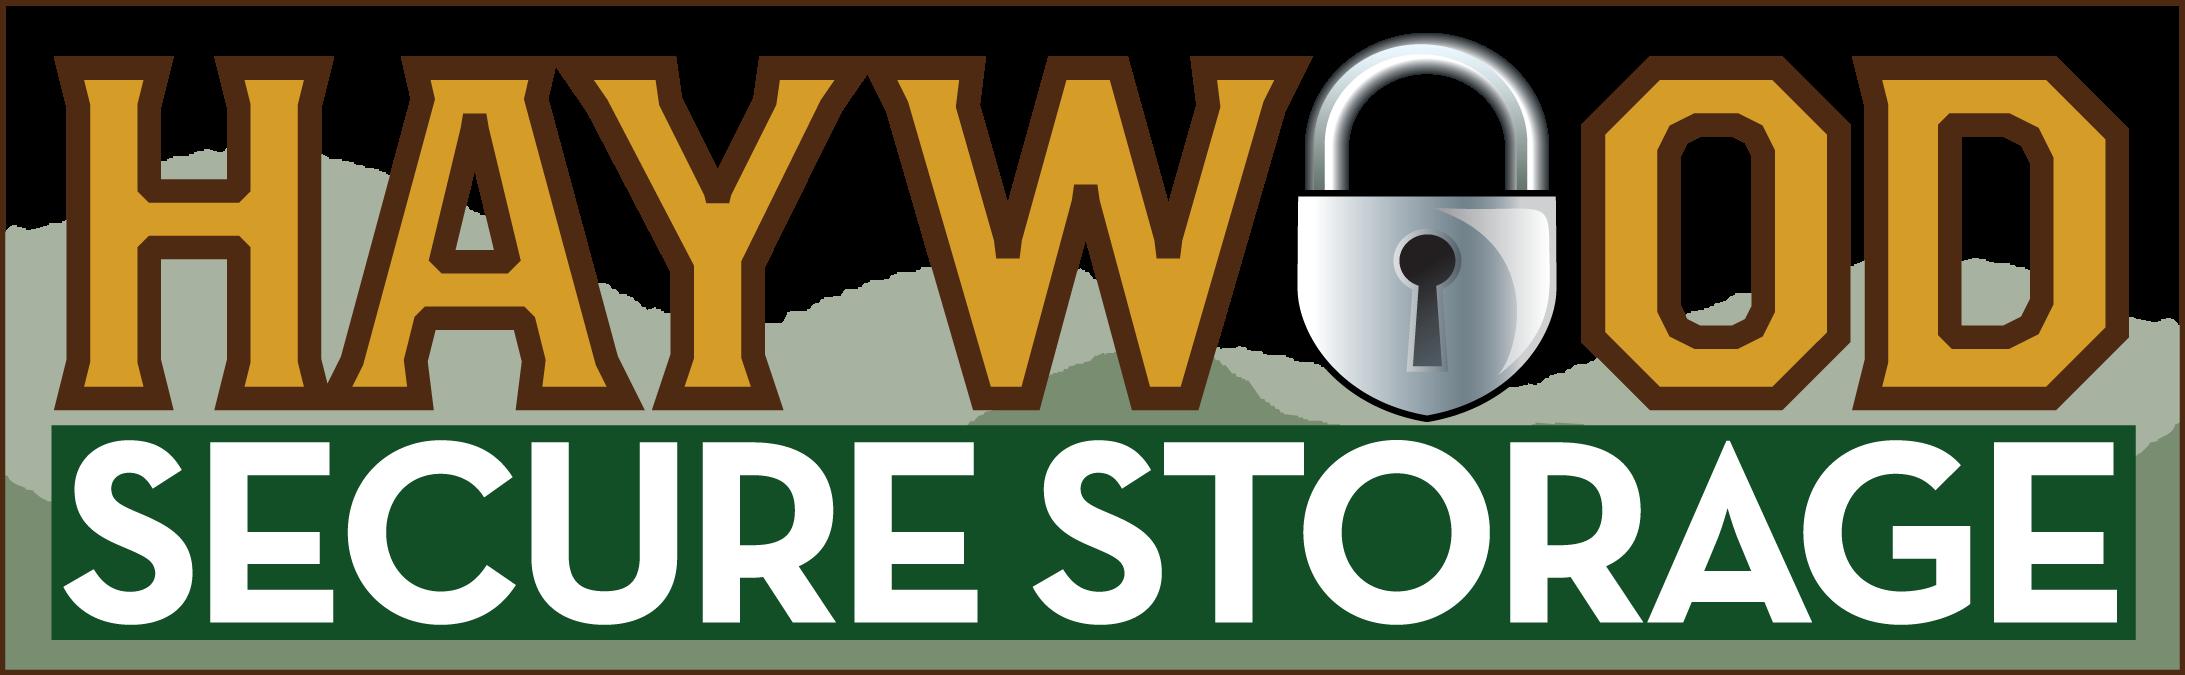 Haywood Secure Storage, Inc.